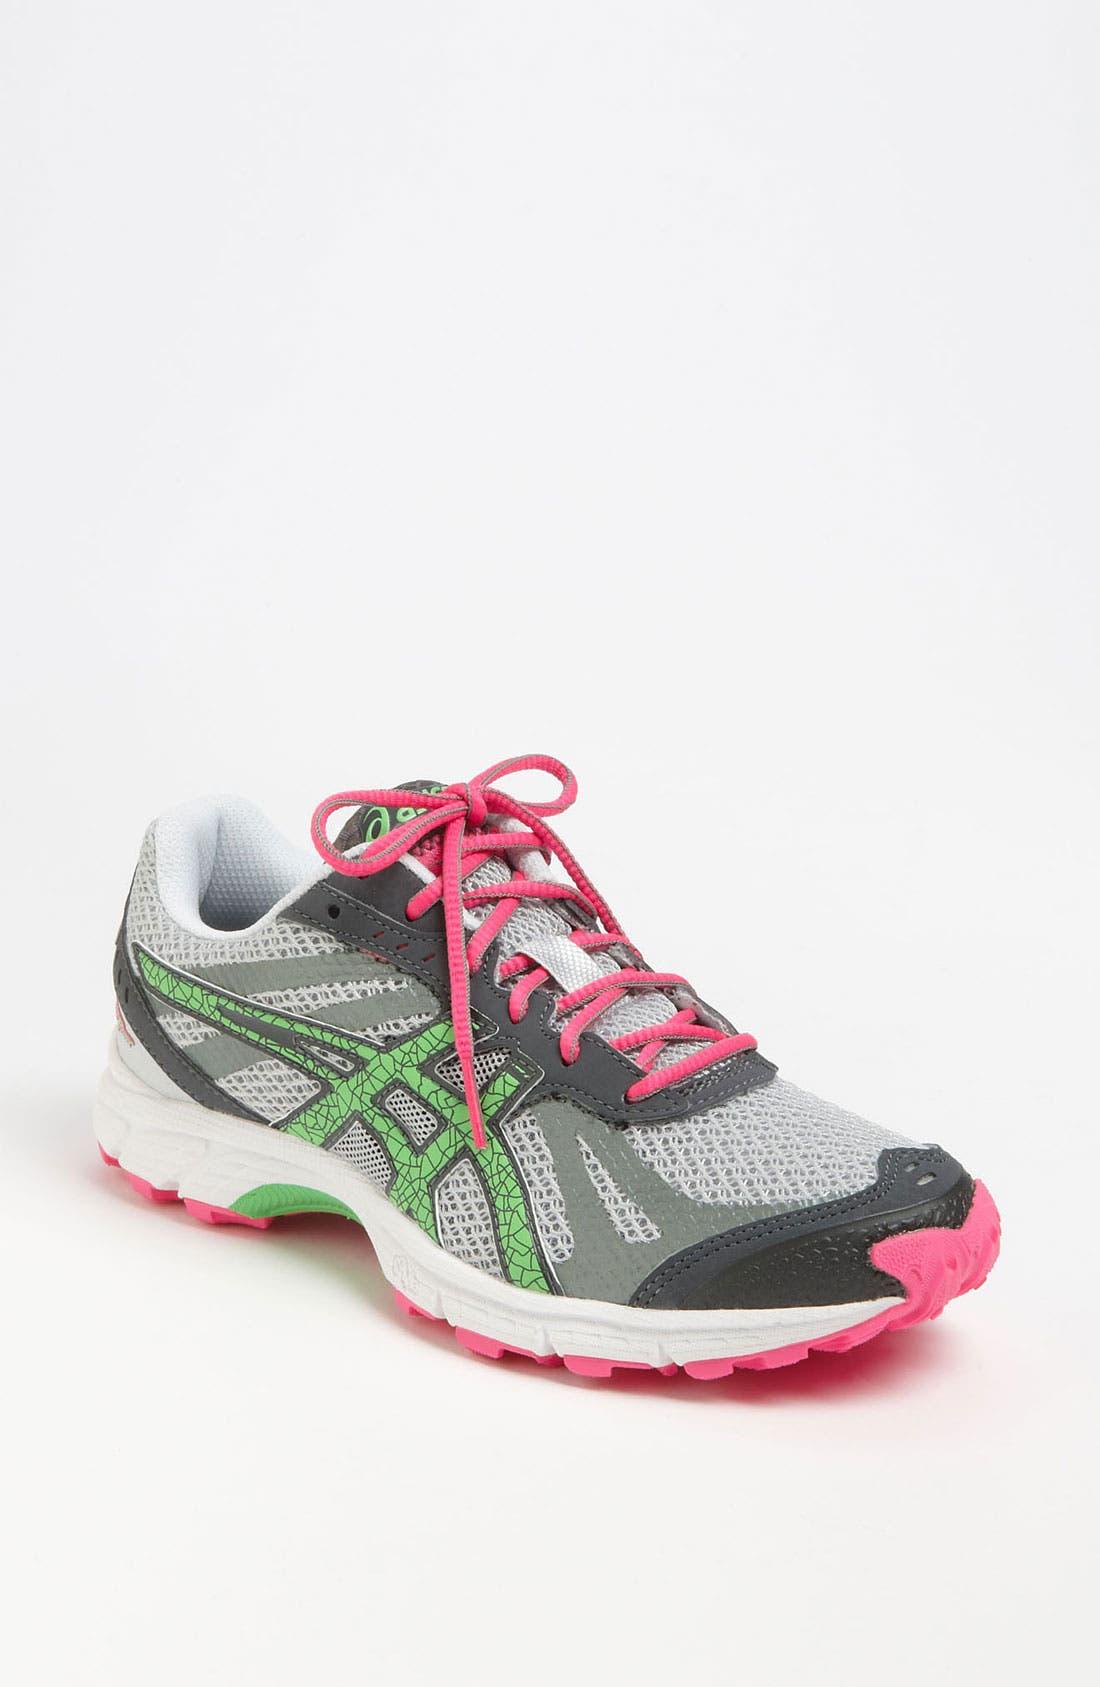 Main Image - ASICS® 'GEL-Fuji Racer' Running Shoe (Women)